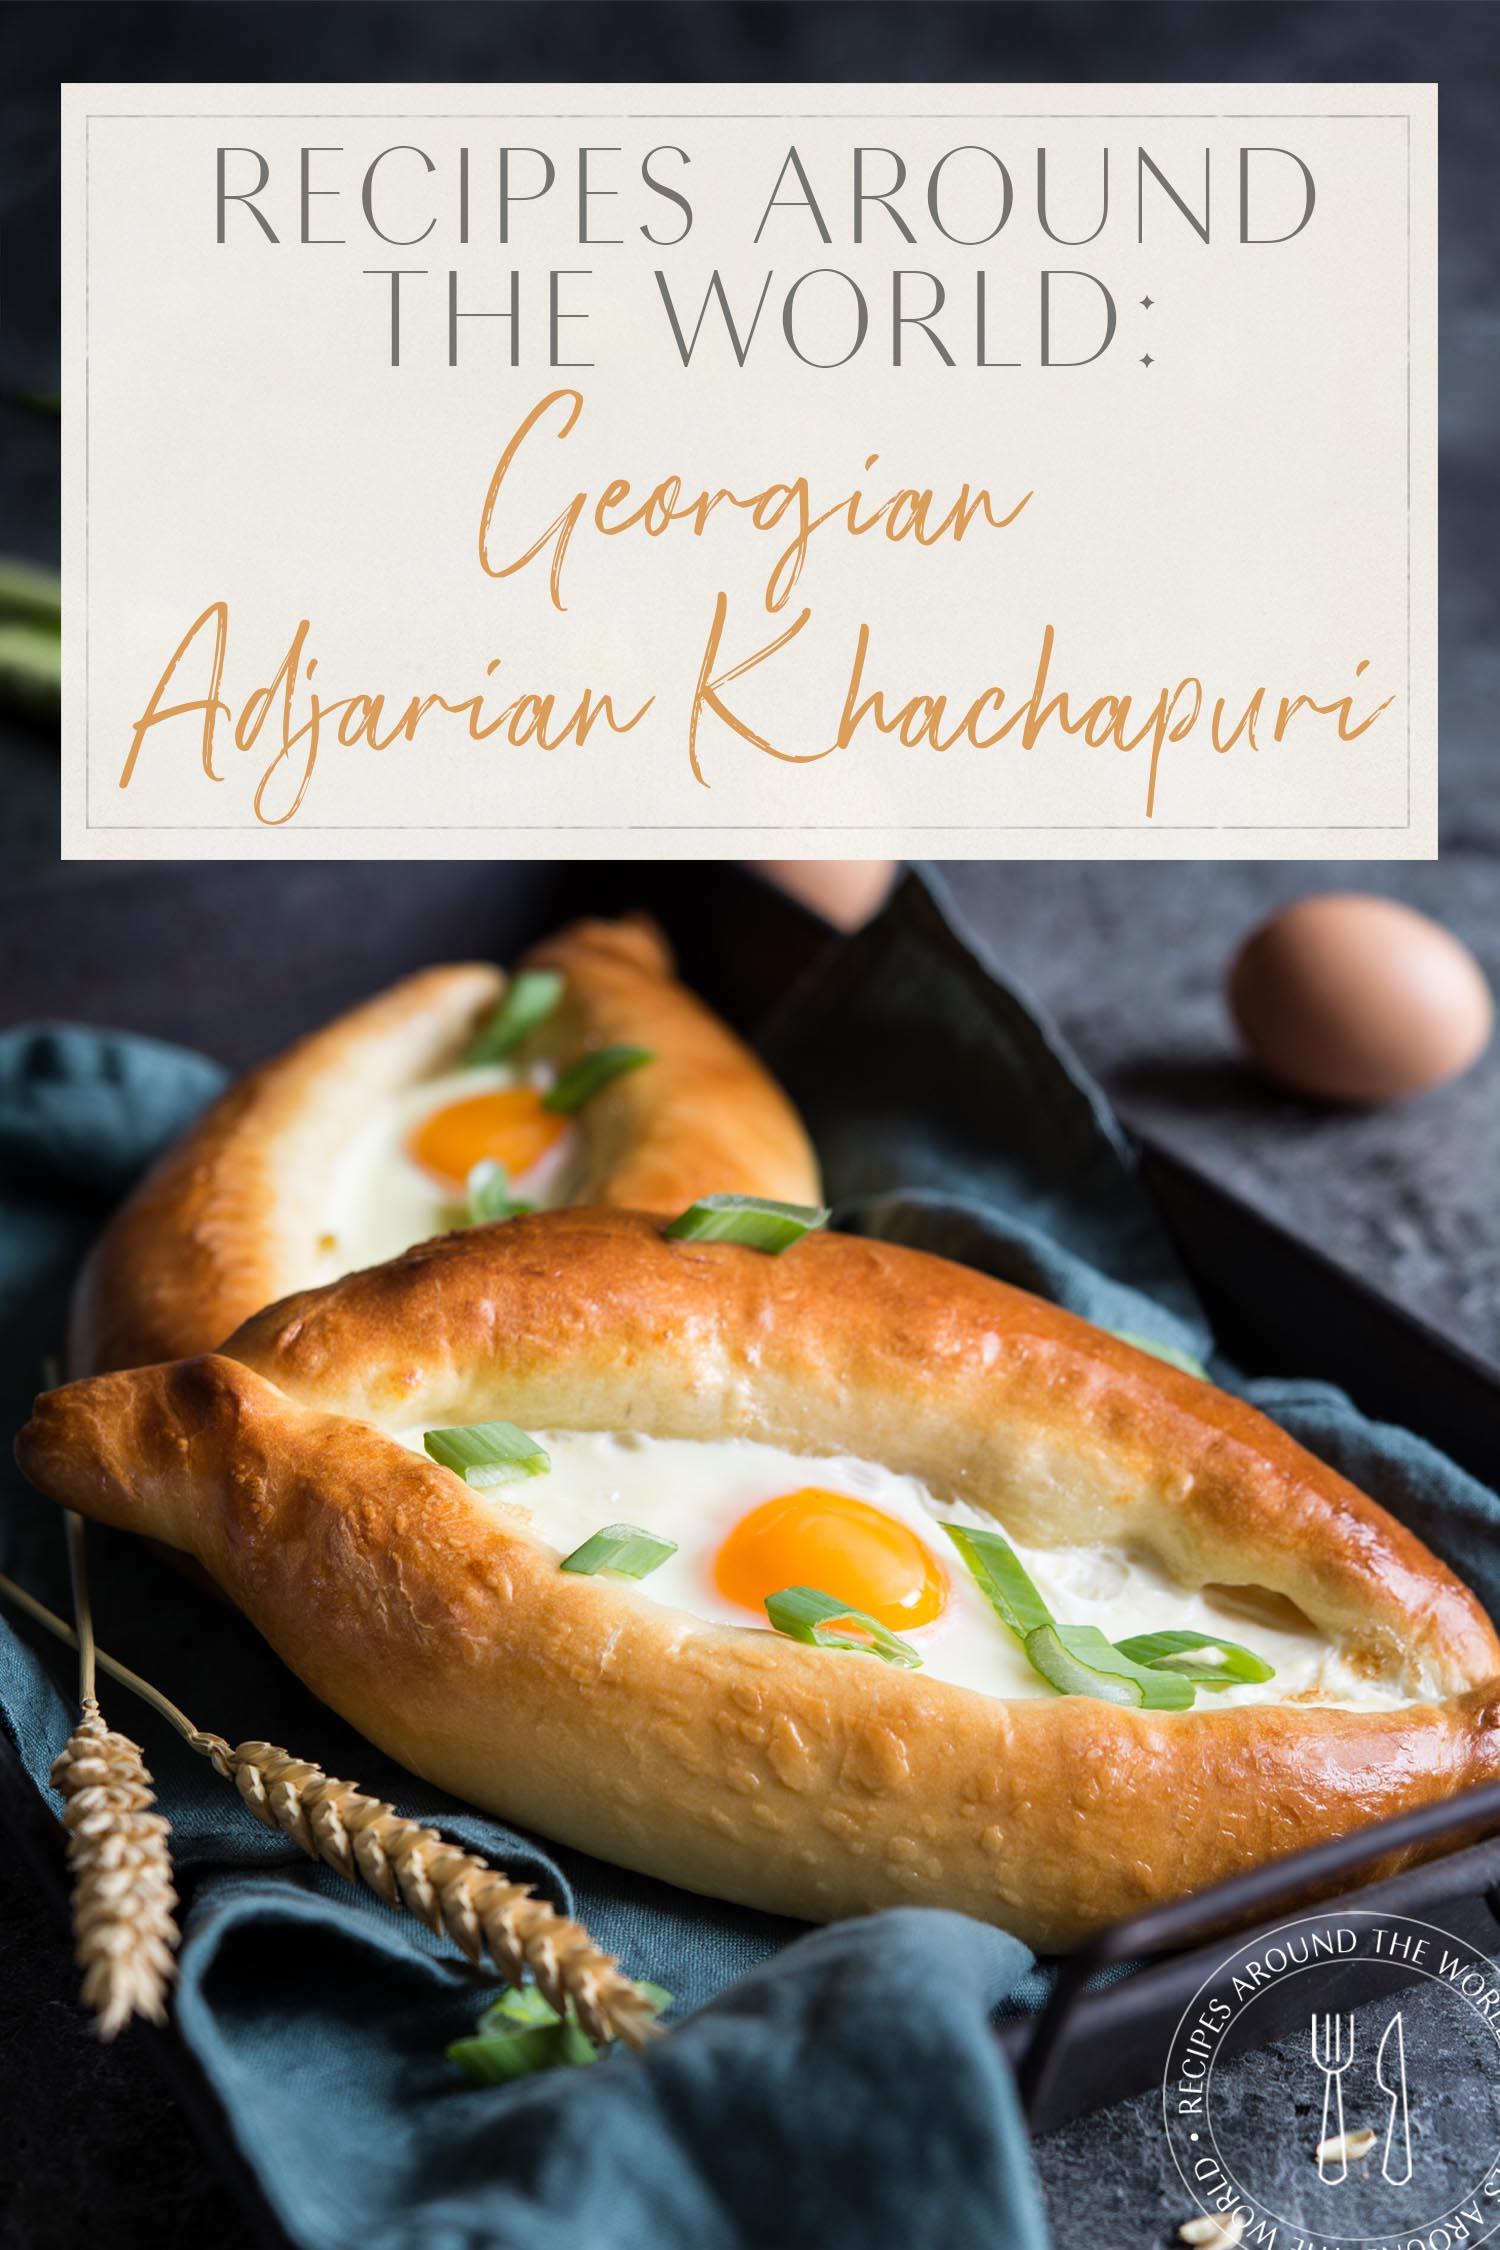 Georgian Adjarian Khachapuri cheese boat